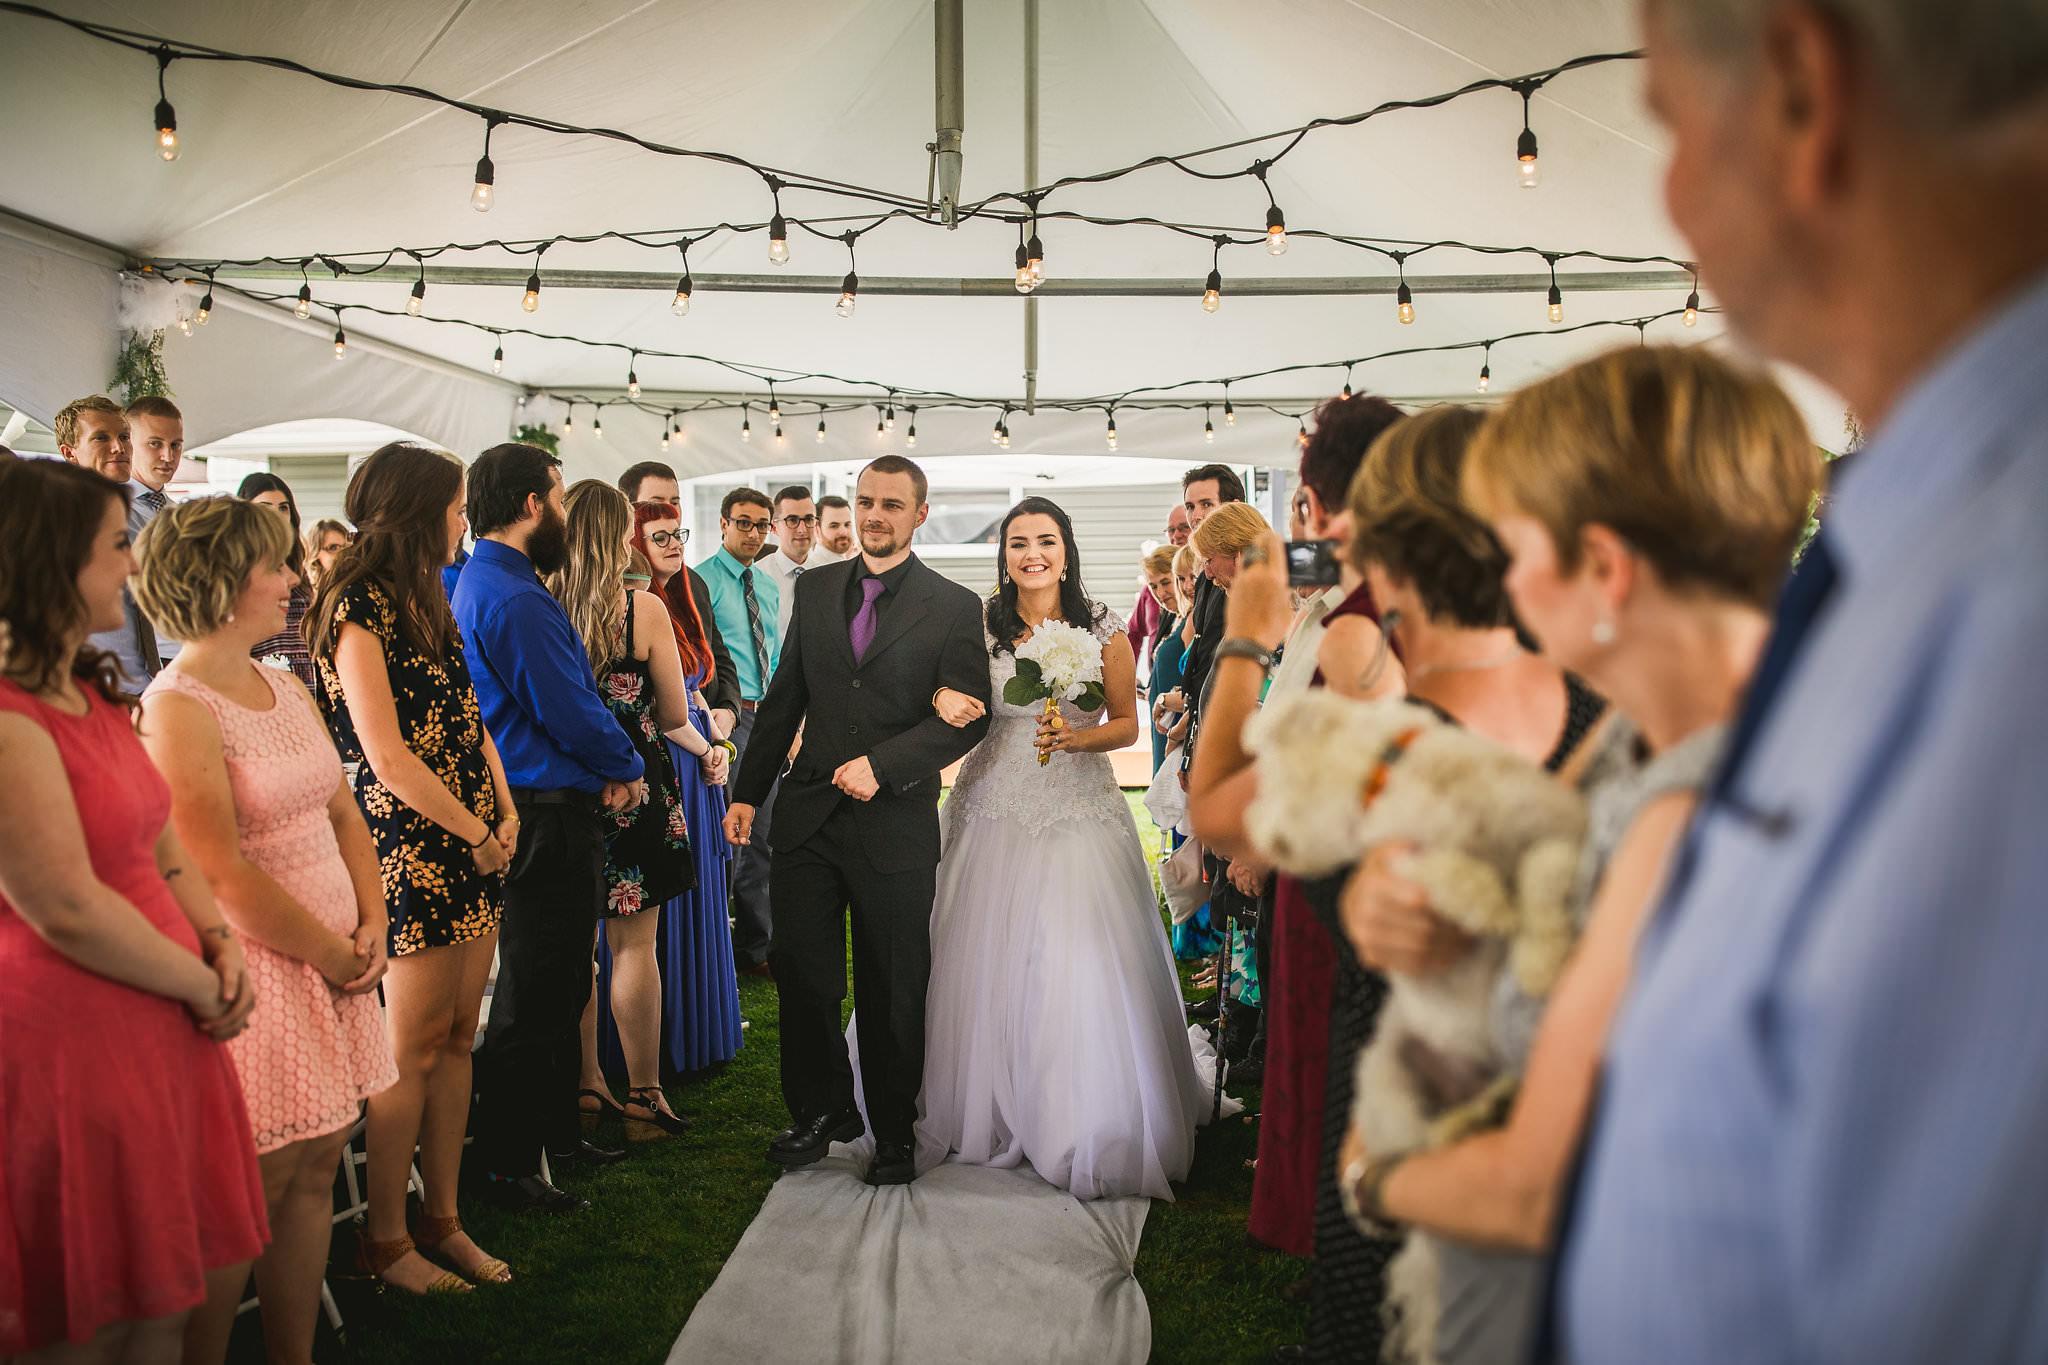 Kristen Adam Kindred Loft Whitby Wedding Photos 154 - Durham Wedding Photographer: Kindred Loft Wedding Photos